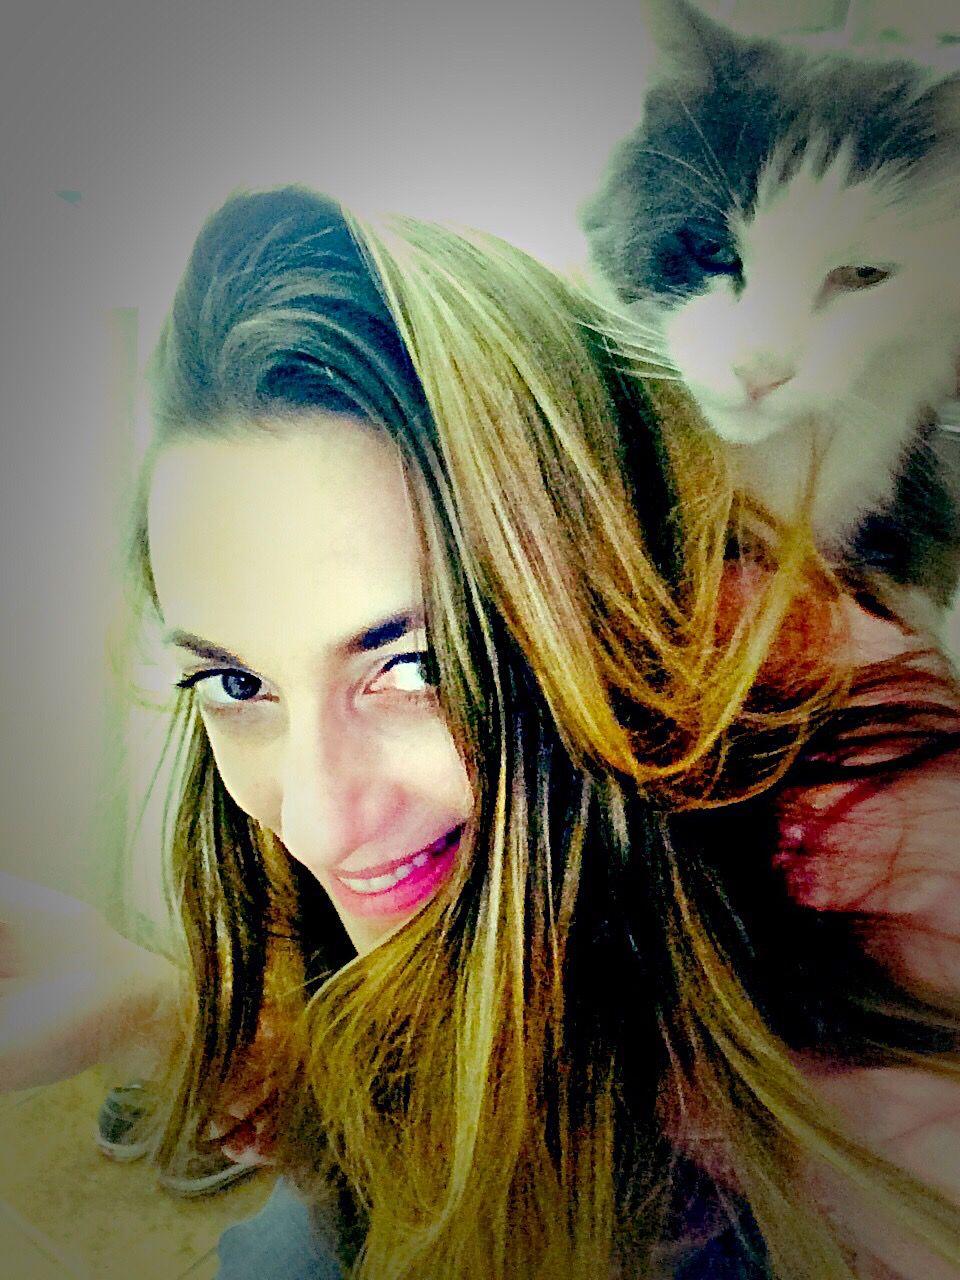 #petselfie #myfirstbaby #osciedoscie #bondingduringbathroomtime #alwaystogether🌈